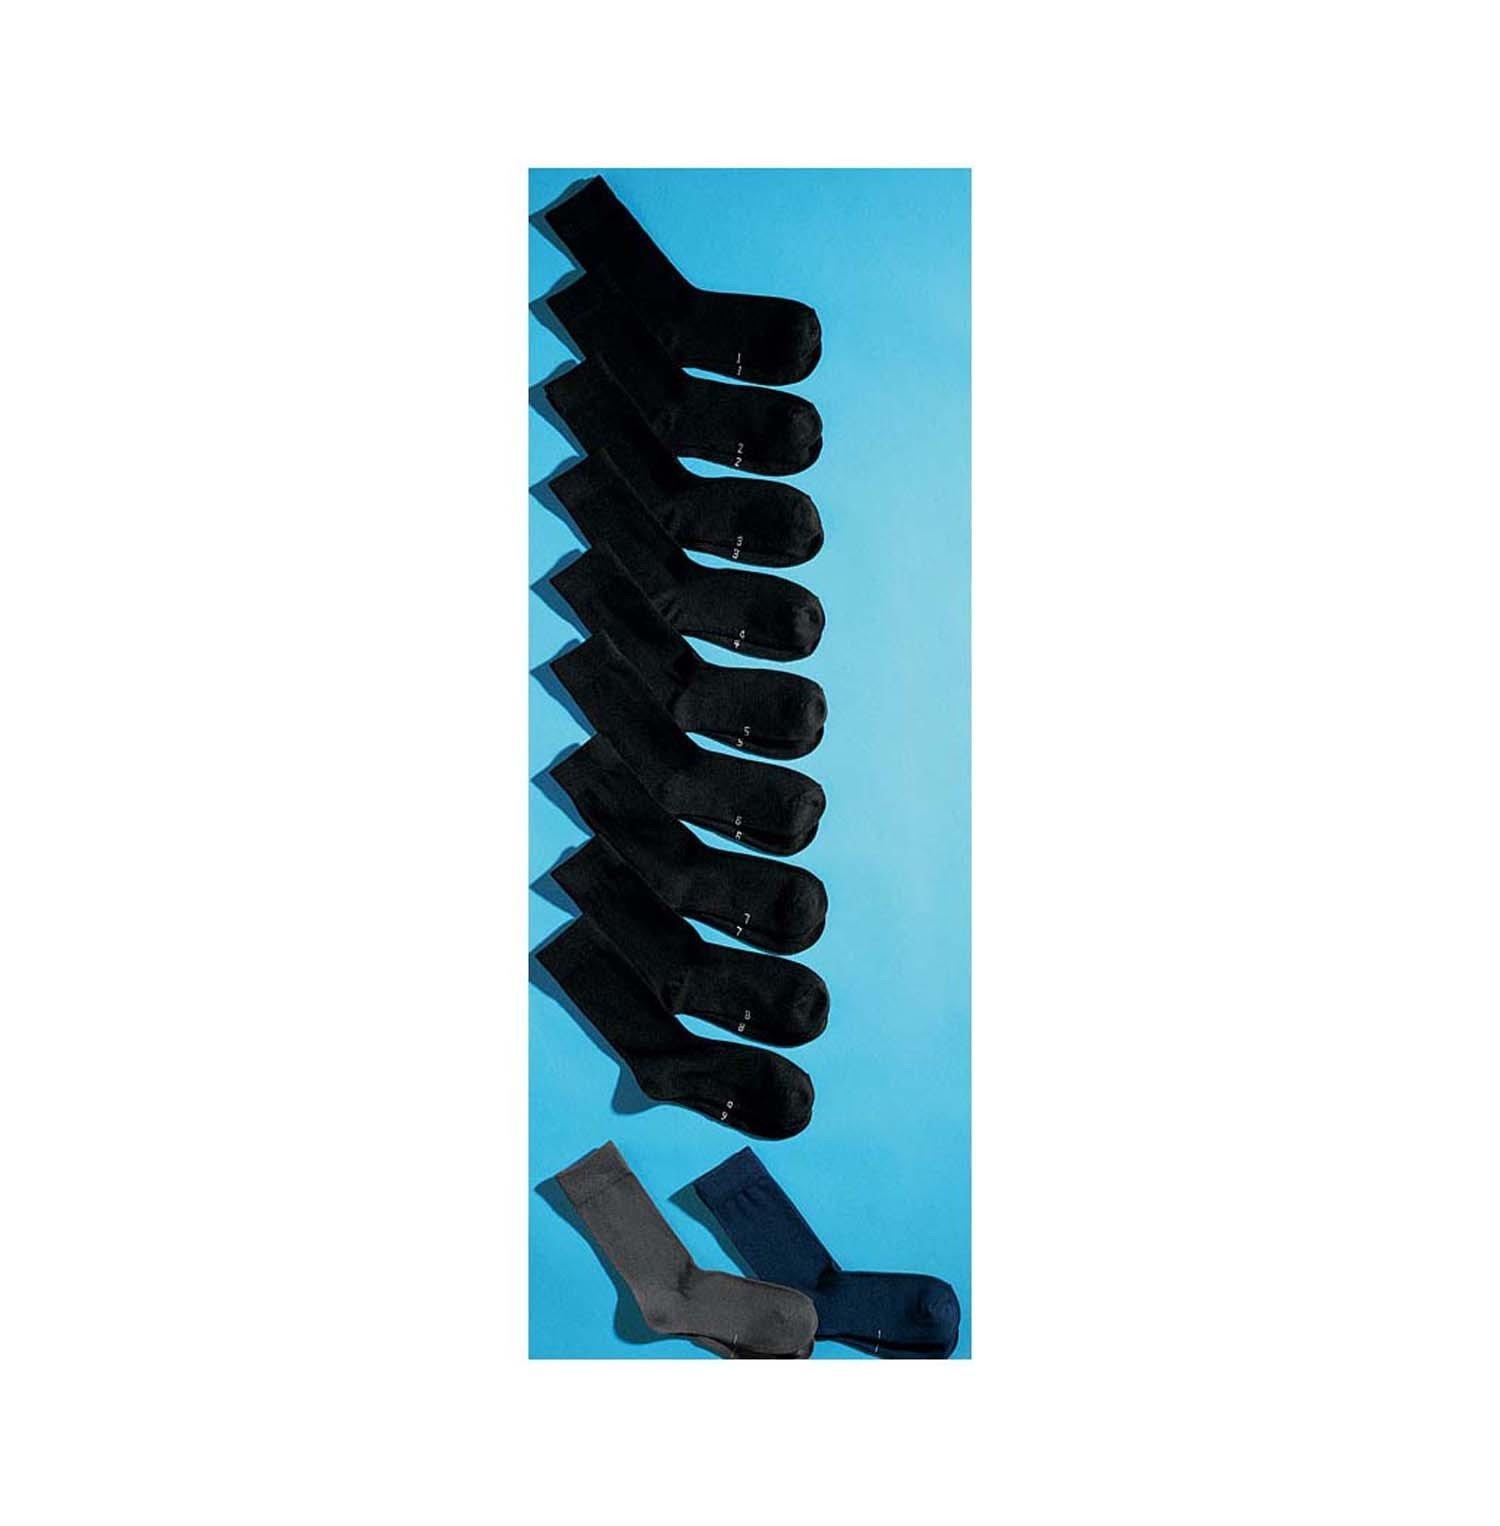 U-Socken,Nr.9er-Set,schwarz 3538 010